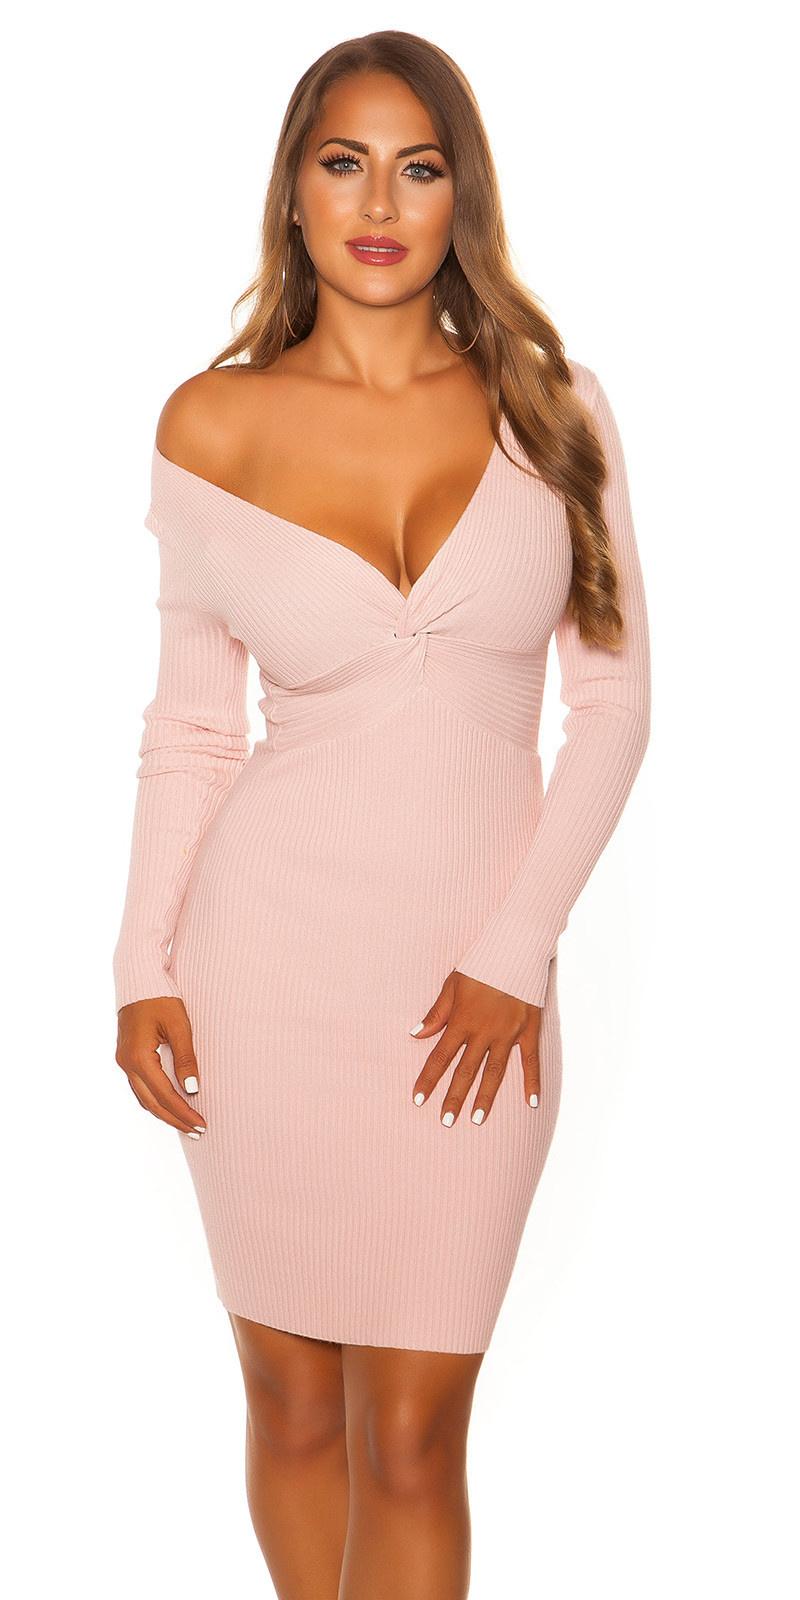 Sexy V Cut Knit Dress Pink